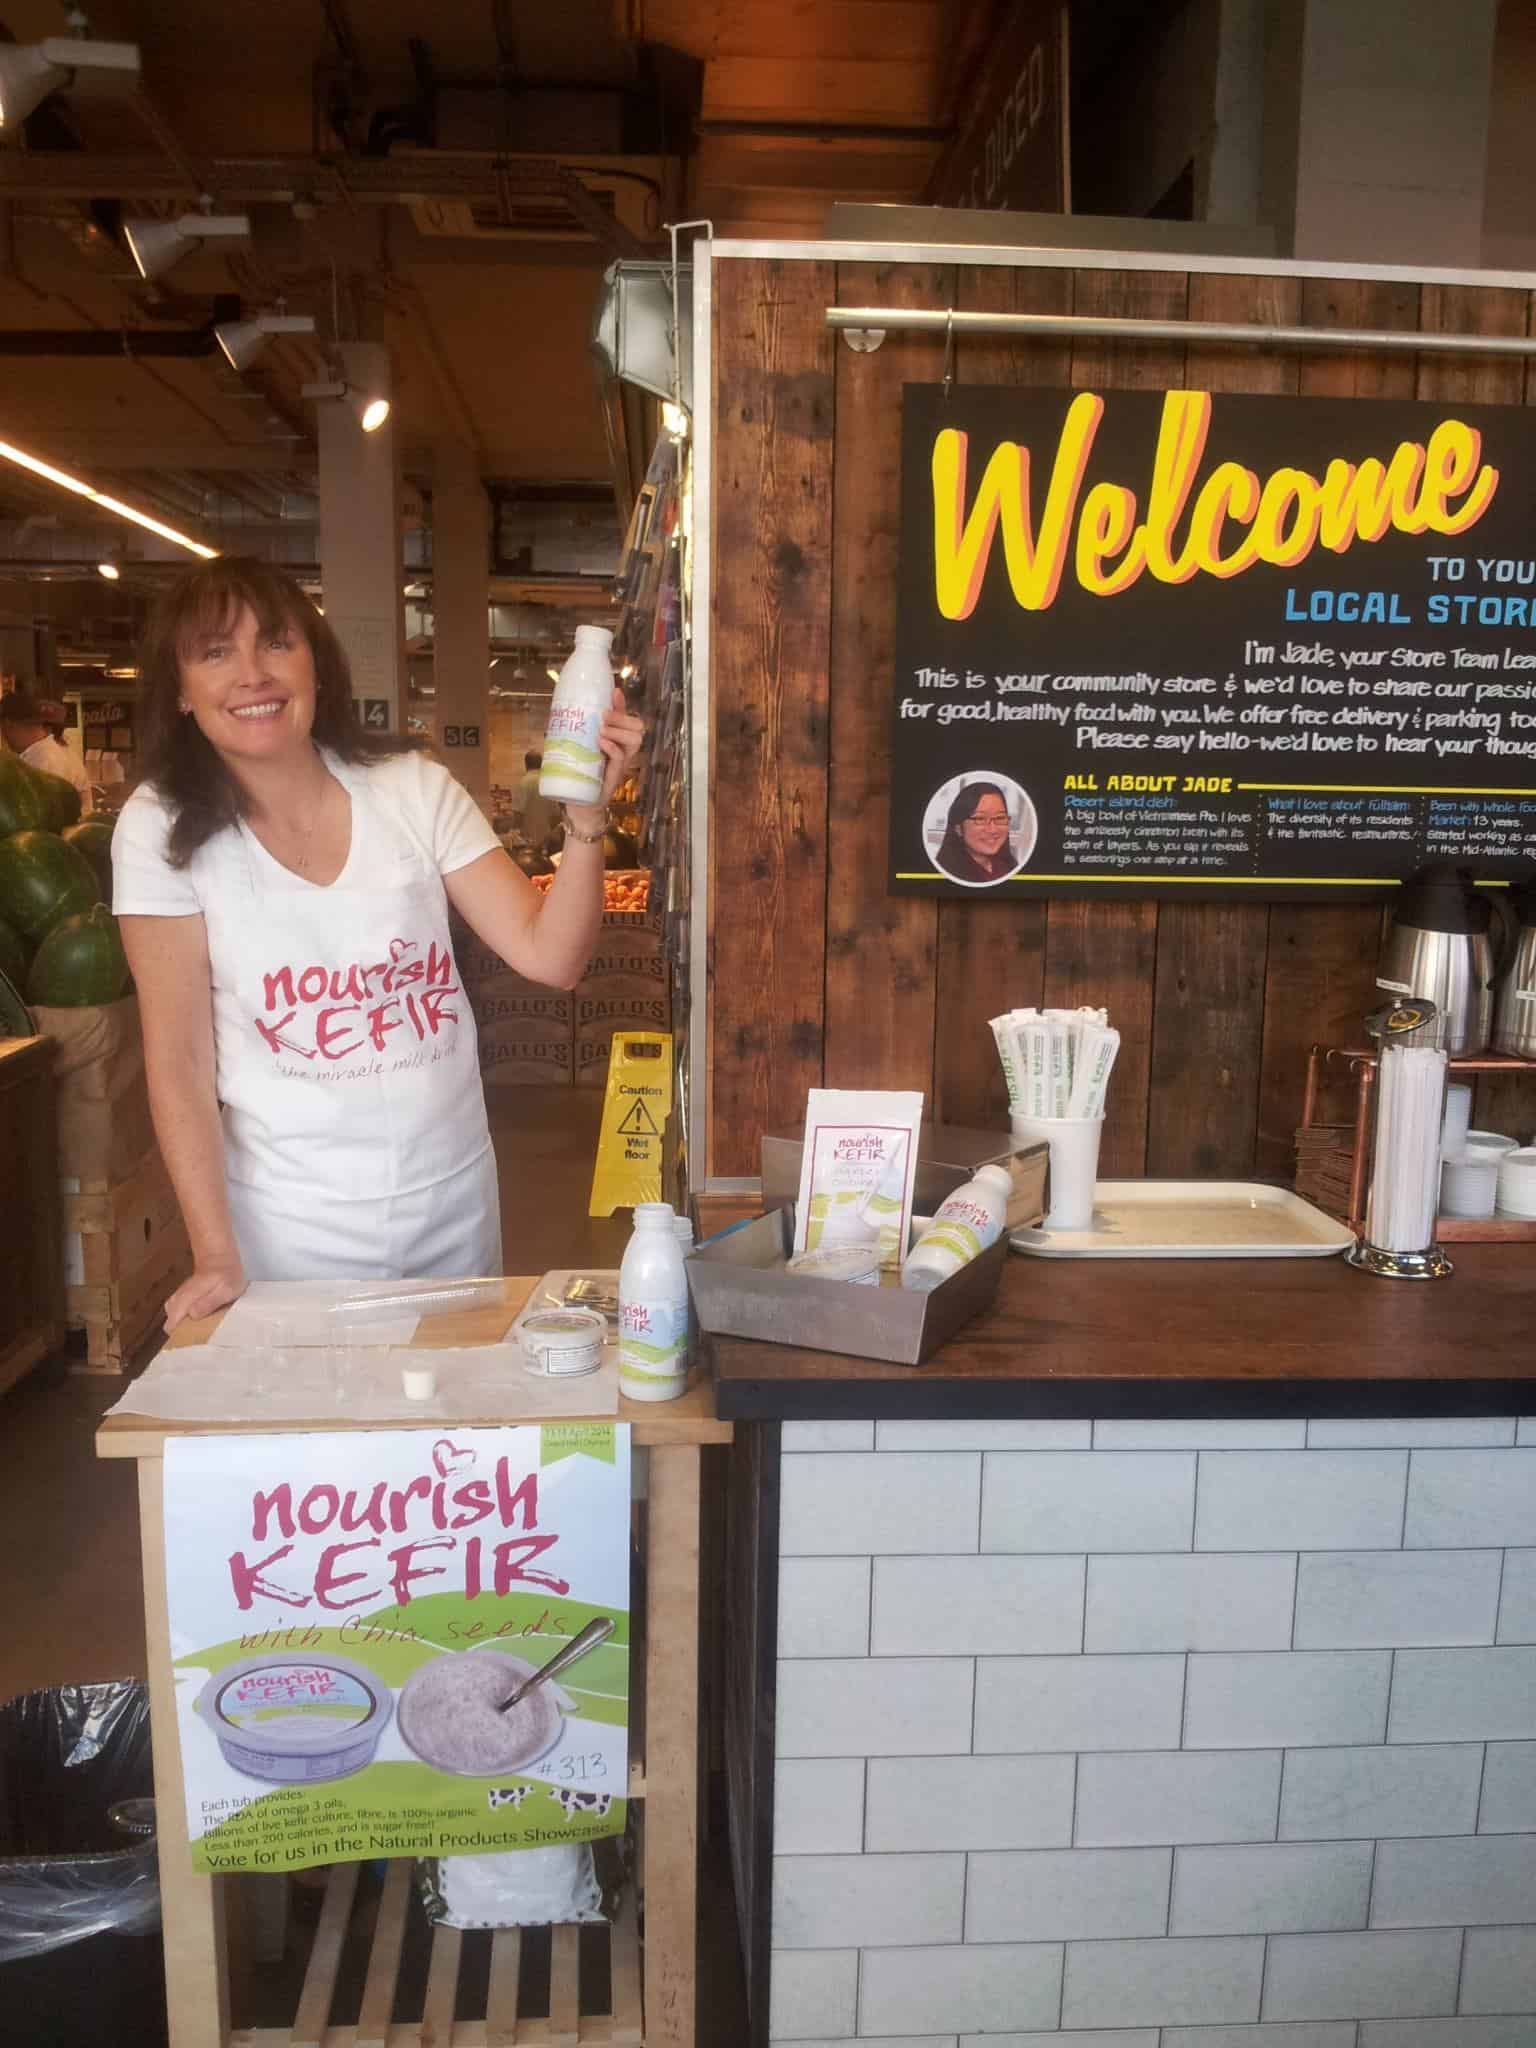 Nourish kefir stall